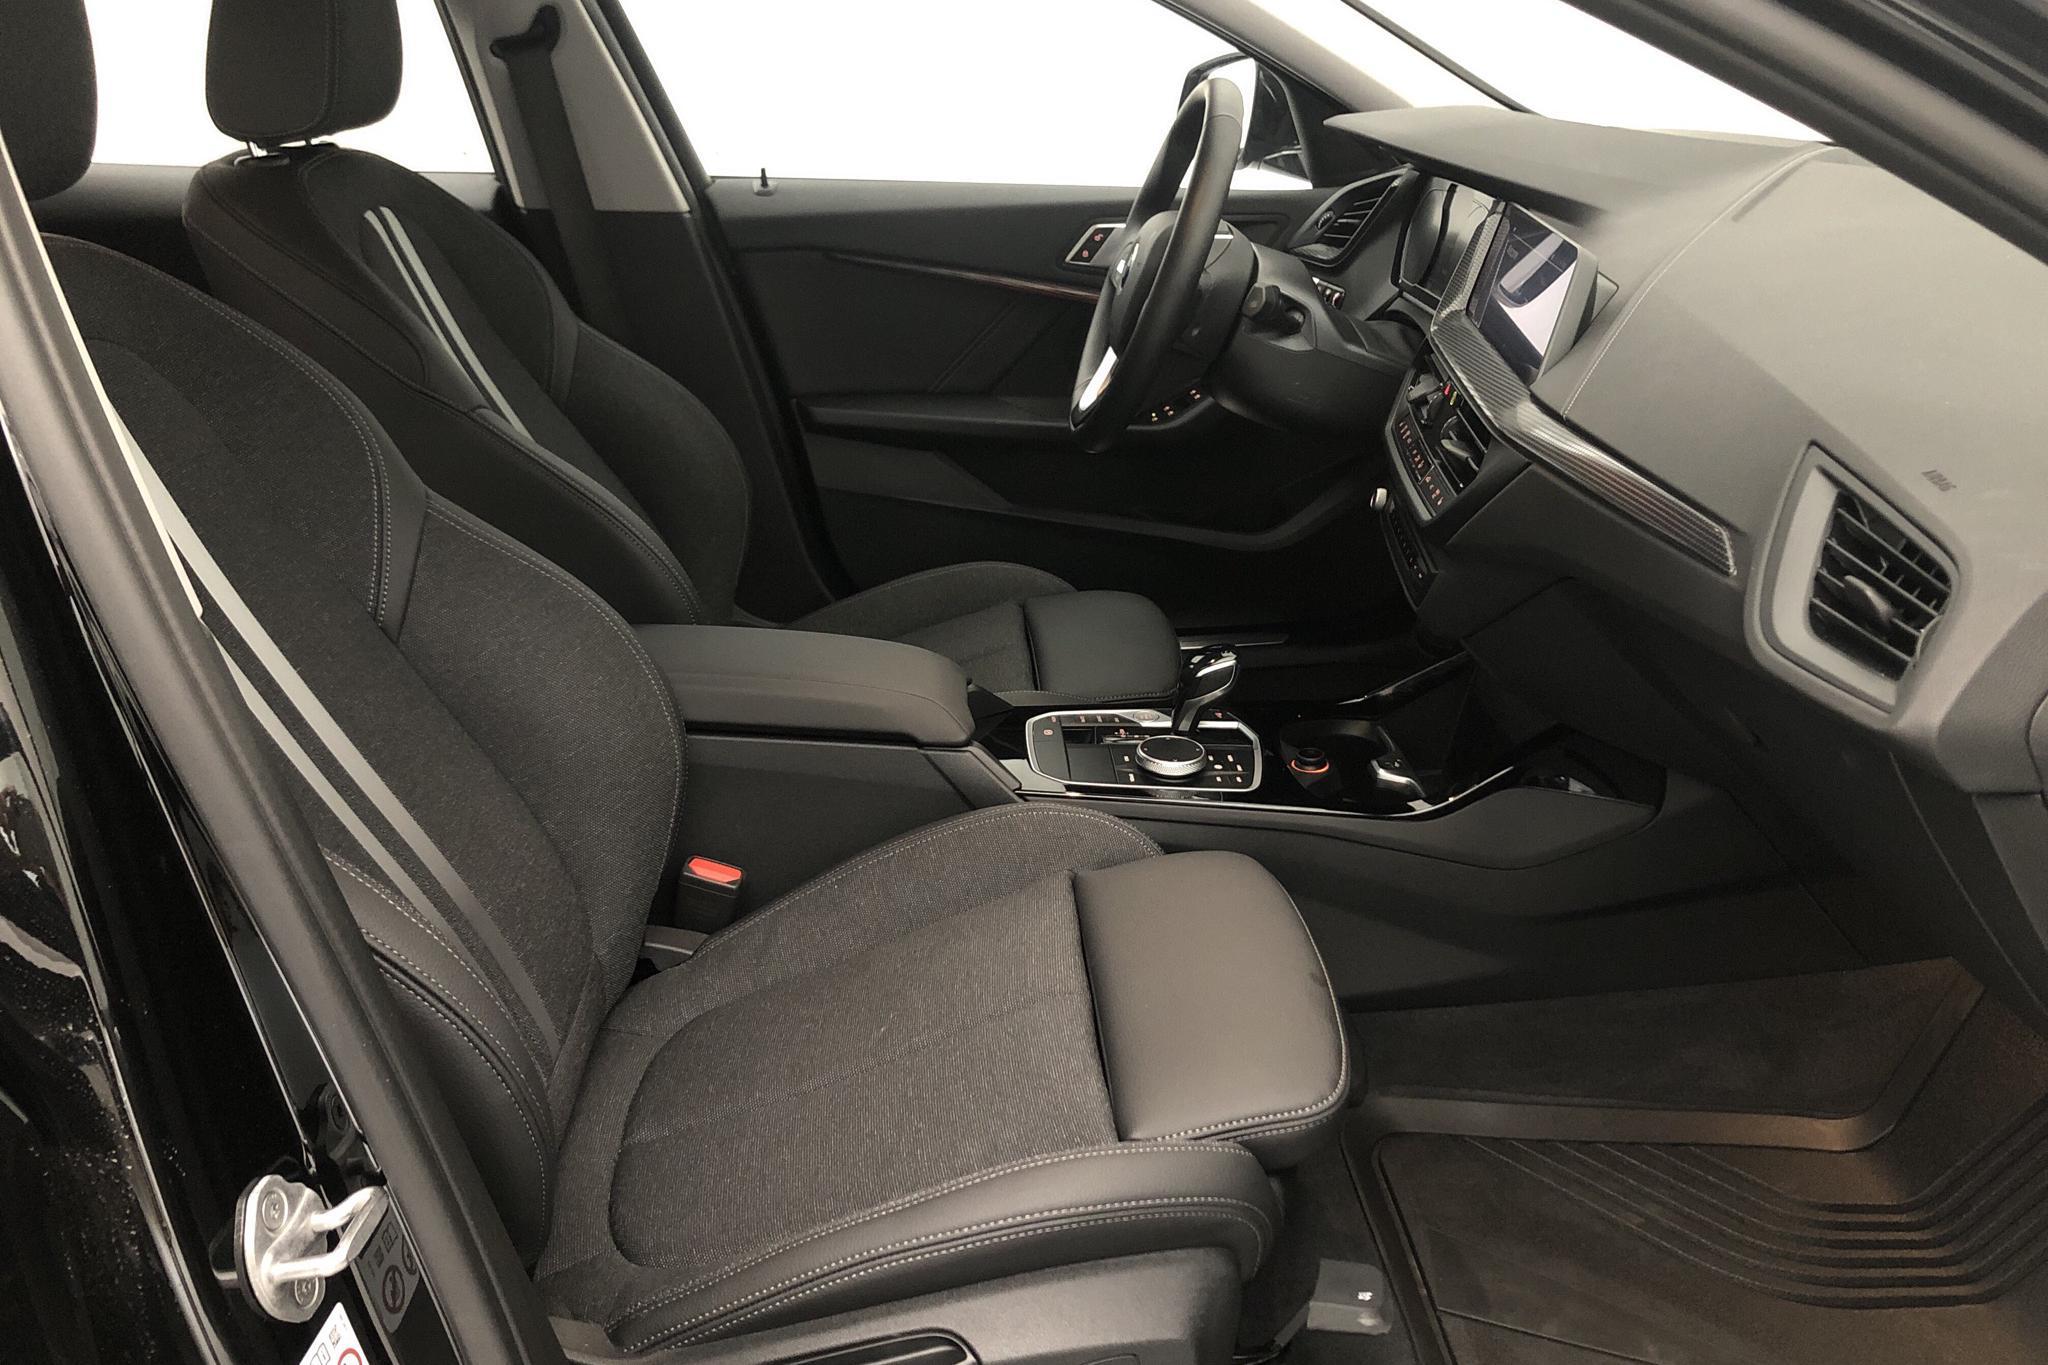 BMW 118i 5dr, F40 (140hk) - 9 440 km - Automatic - black - 2021